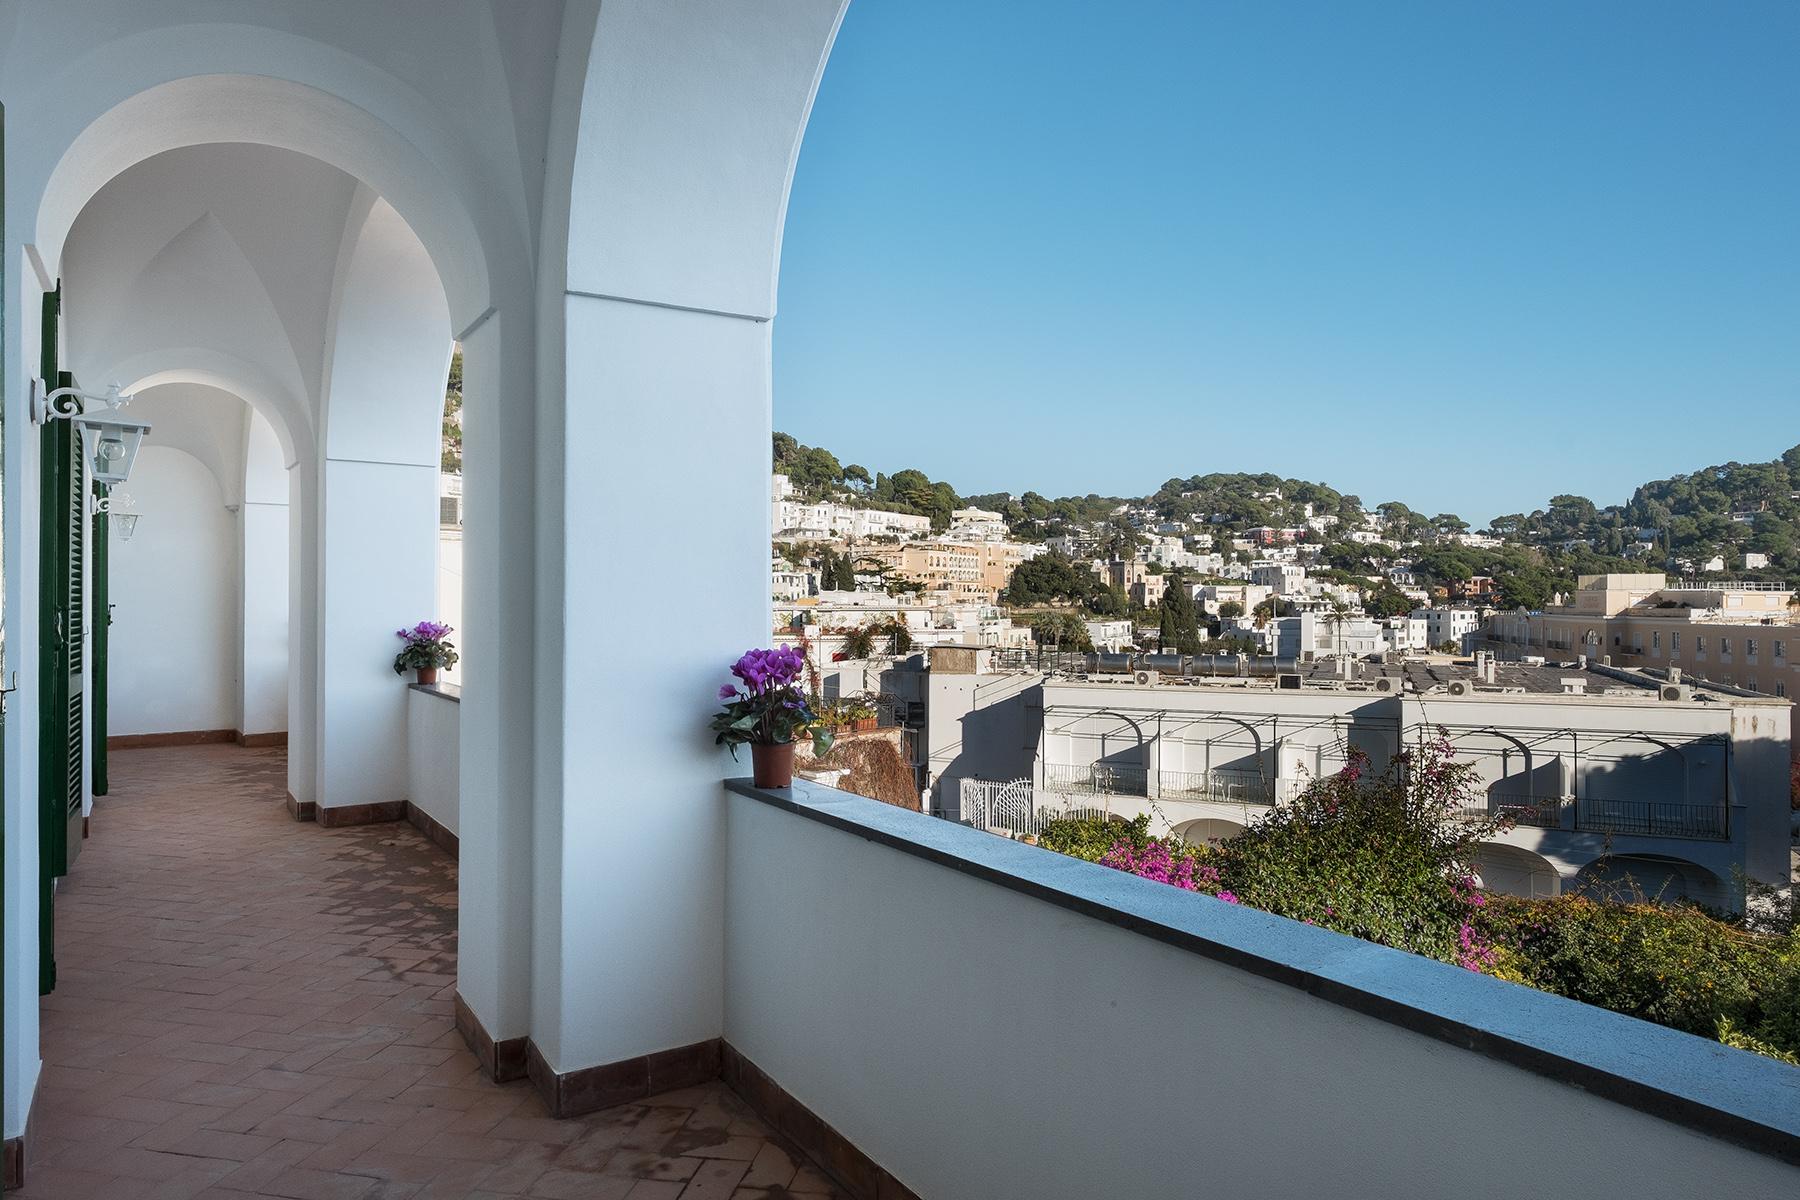 Casa indipendente in Vendita a Capri: 5 locali, 400 mq - Foto 4